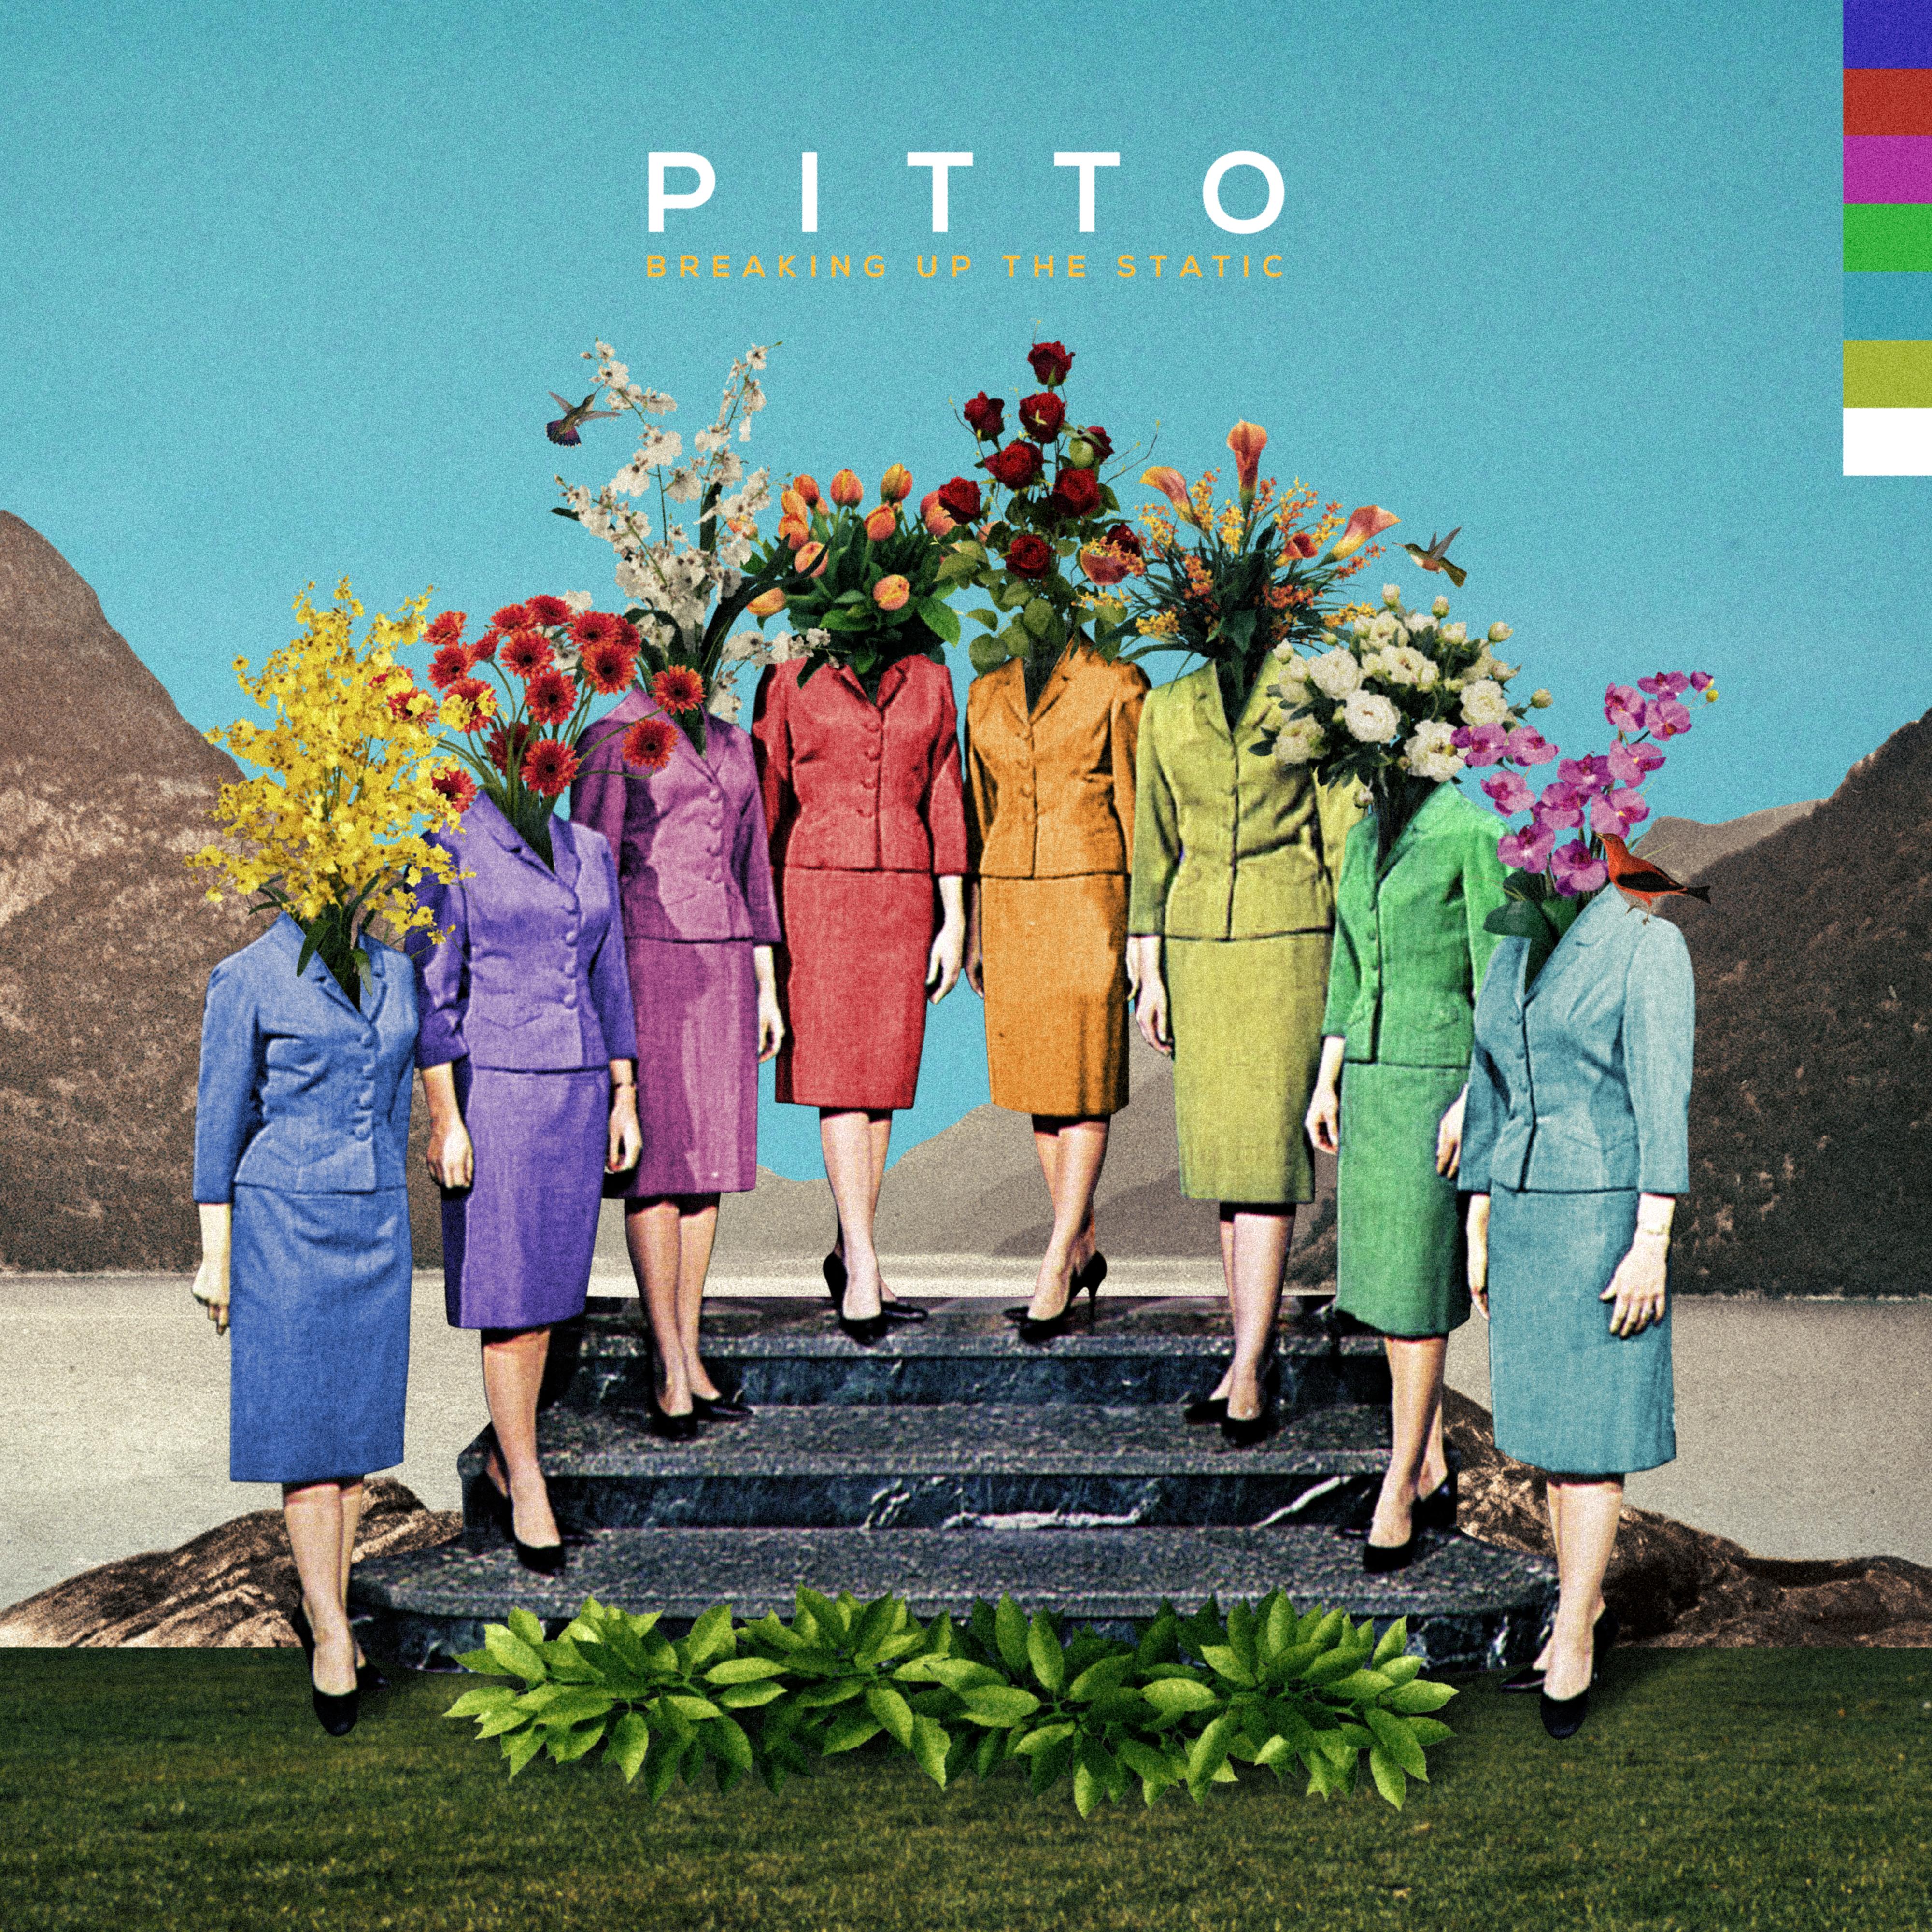 packshot_pitto_-_breaking_up_the_static_-_virgin_records_germanysonar_kollektiv.jpg